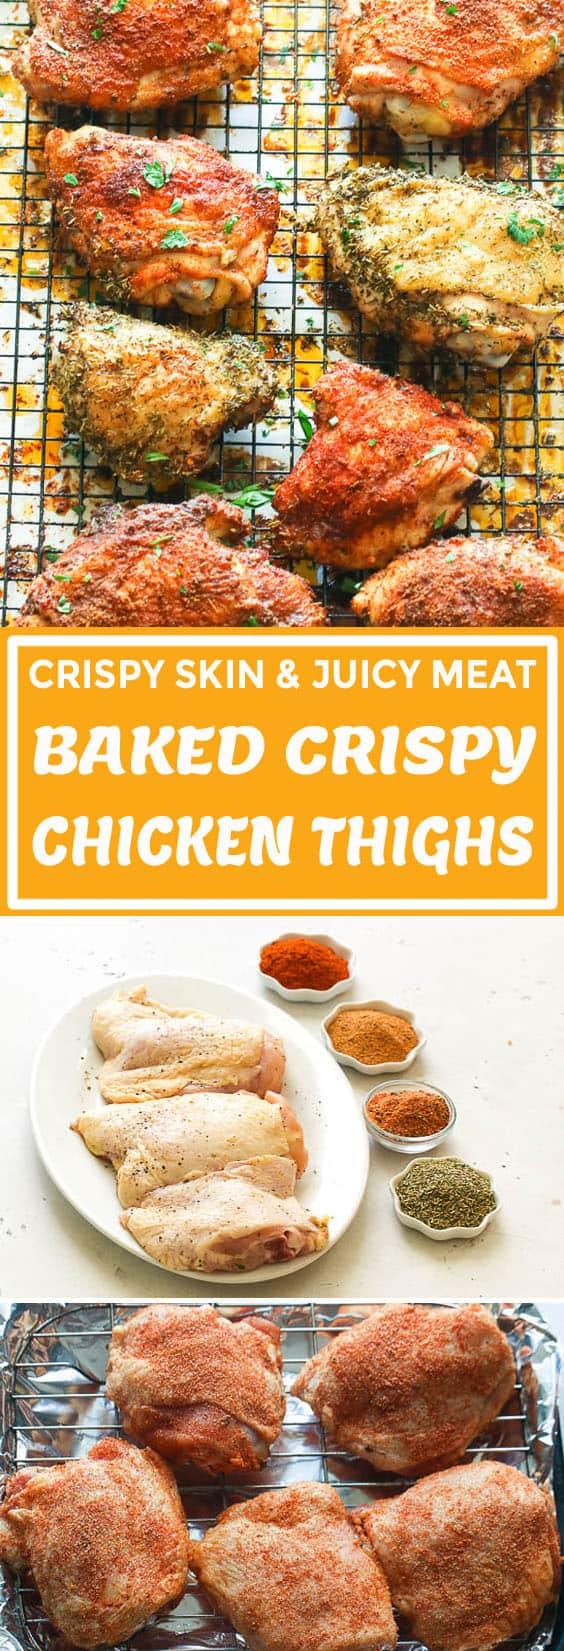 Baked Crispy Chicken Thighs